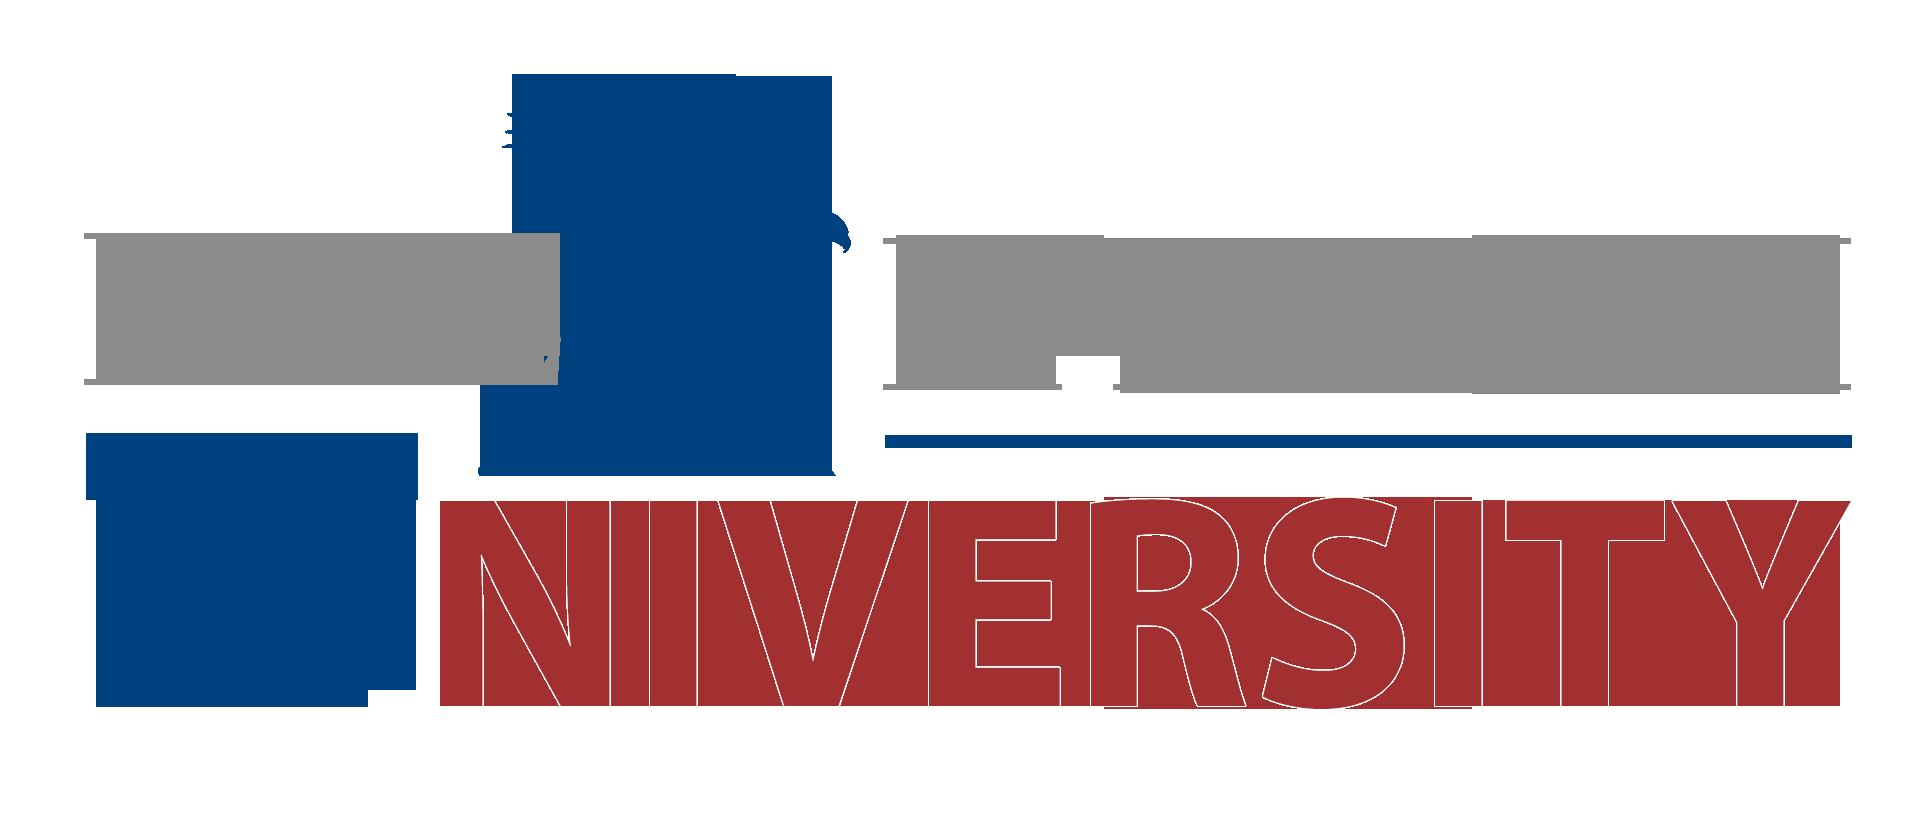 LLUEagleLaunchLogoTV